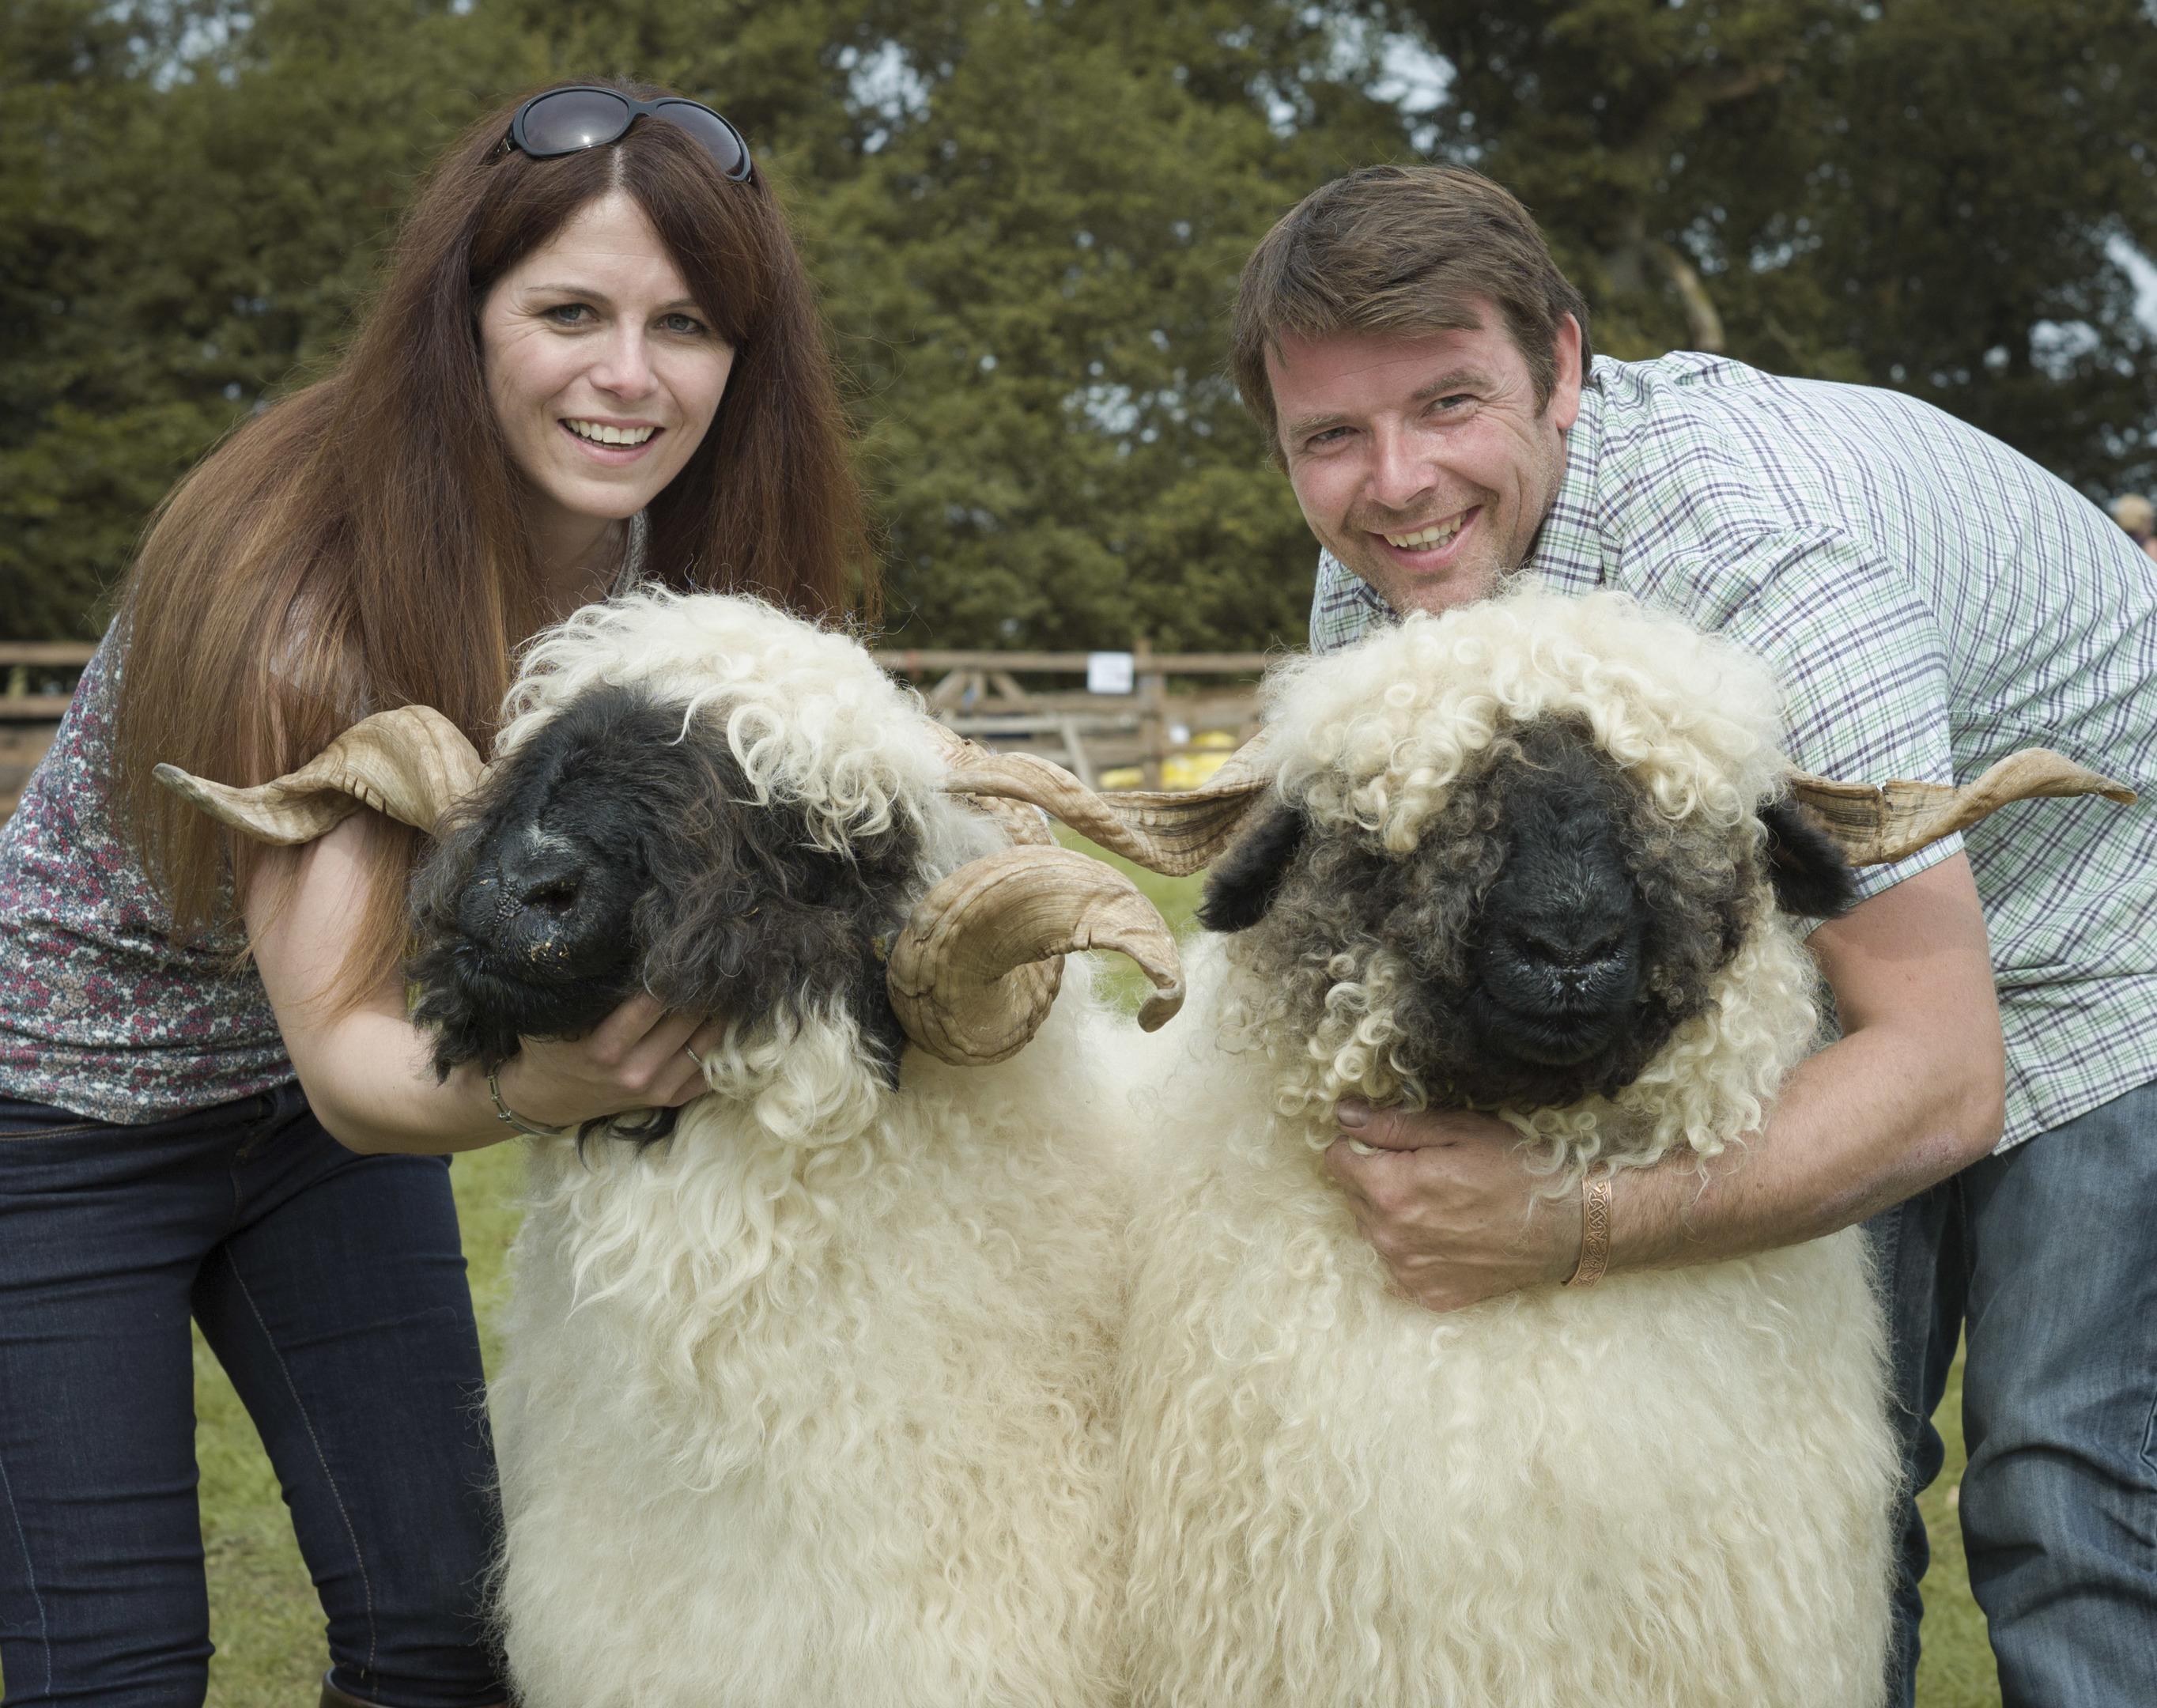 Jenni McAllister and Raymond Irvine holding a couple of their sheep.